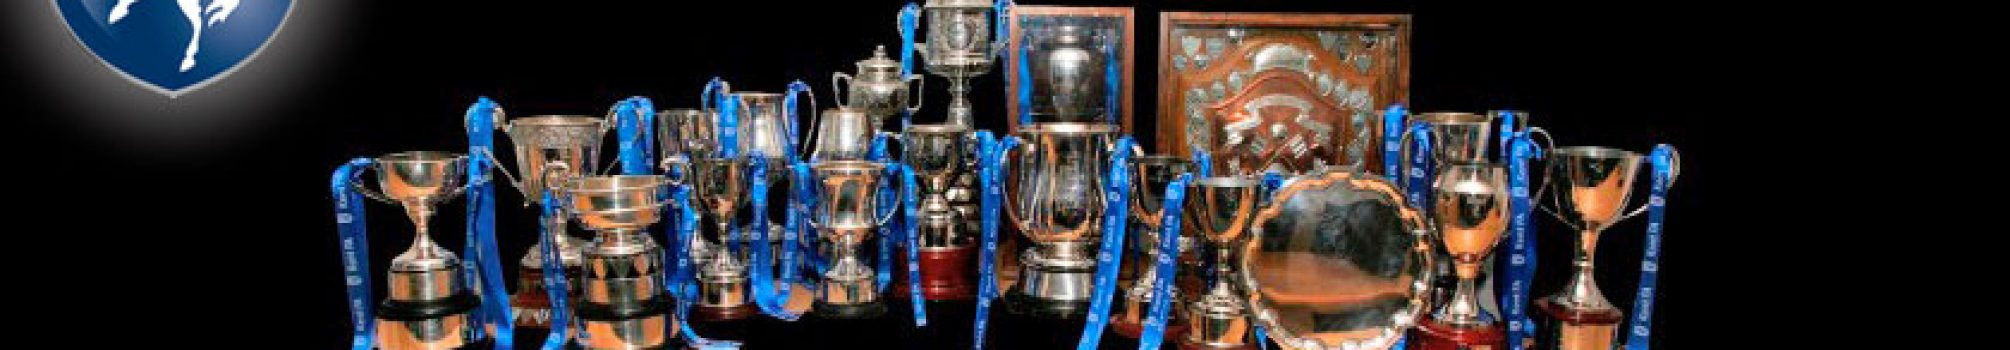 kent-cups